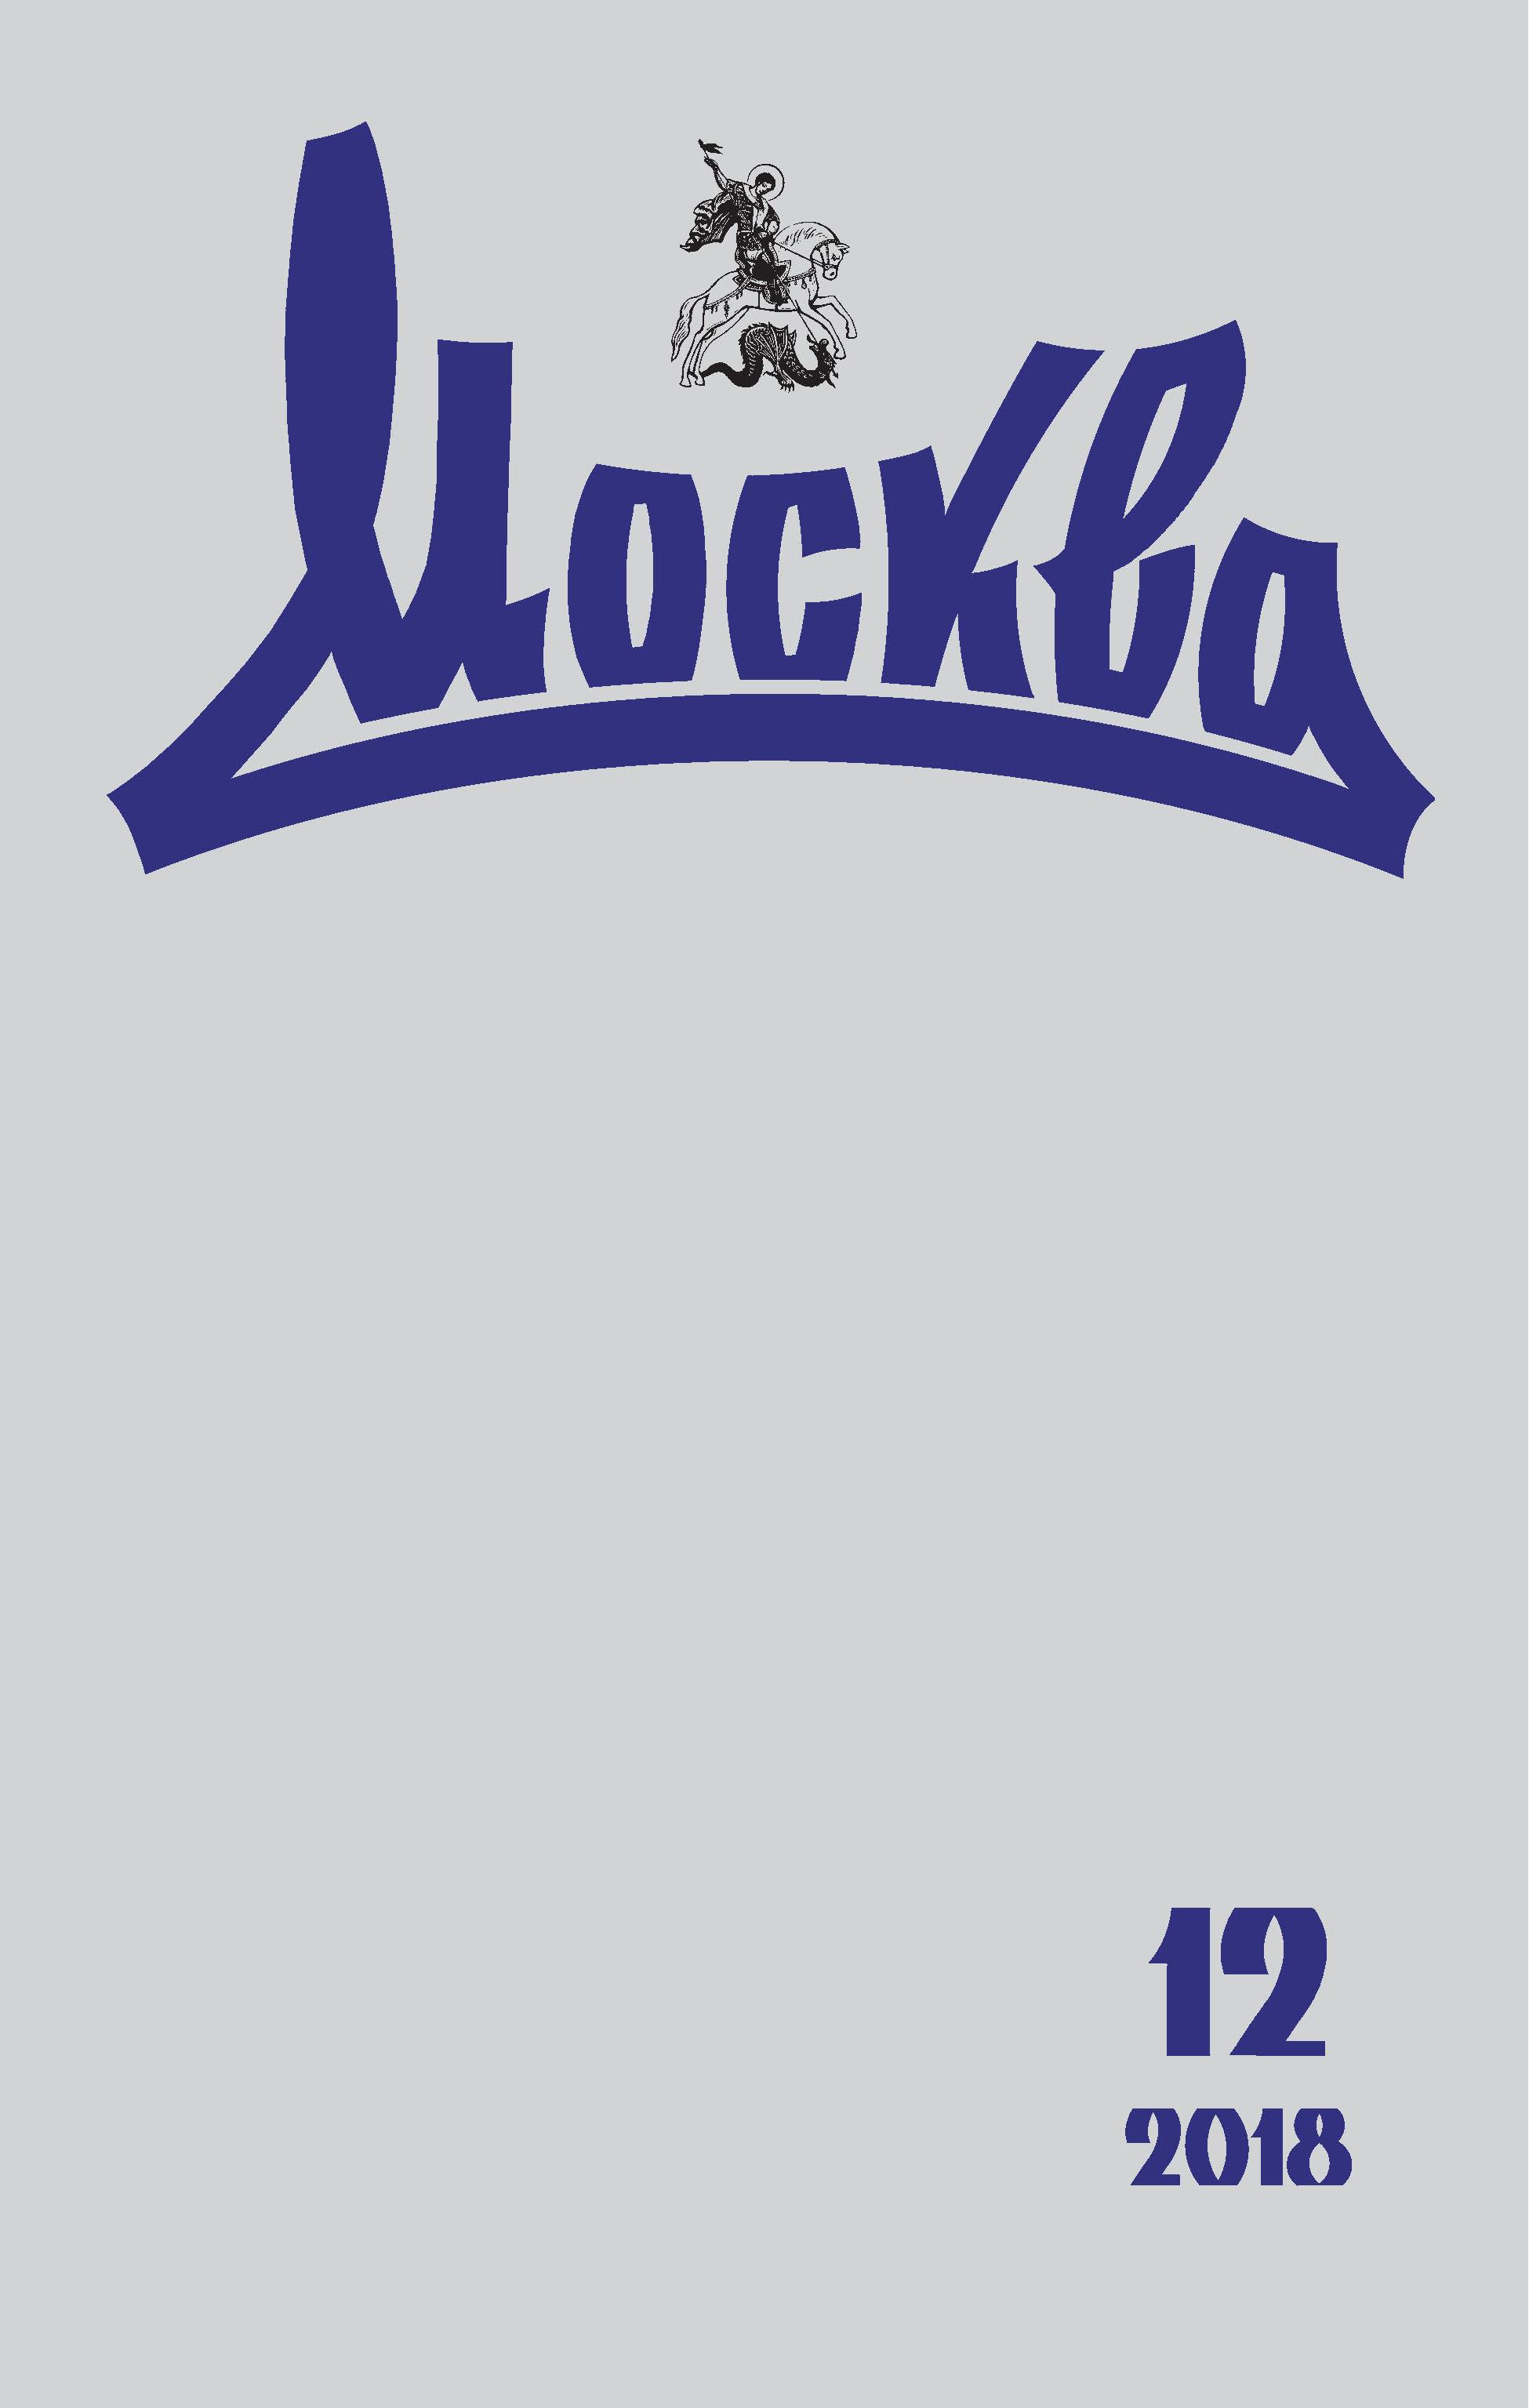 Журнал русской культуры «Москва» №12/2018